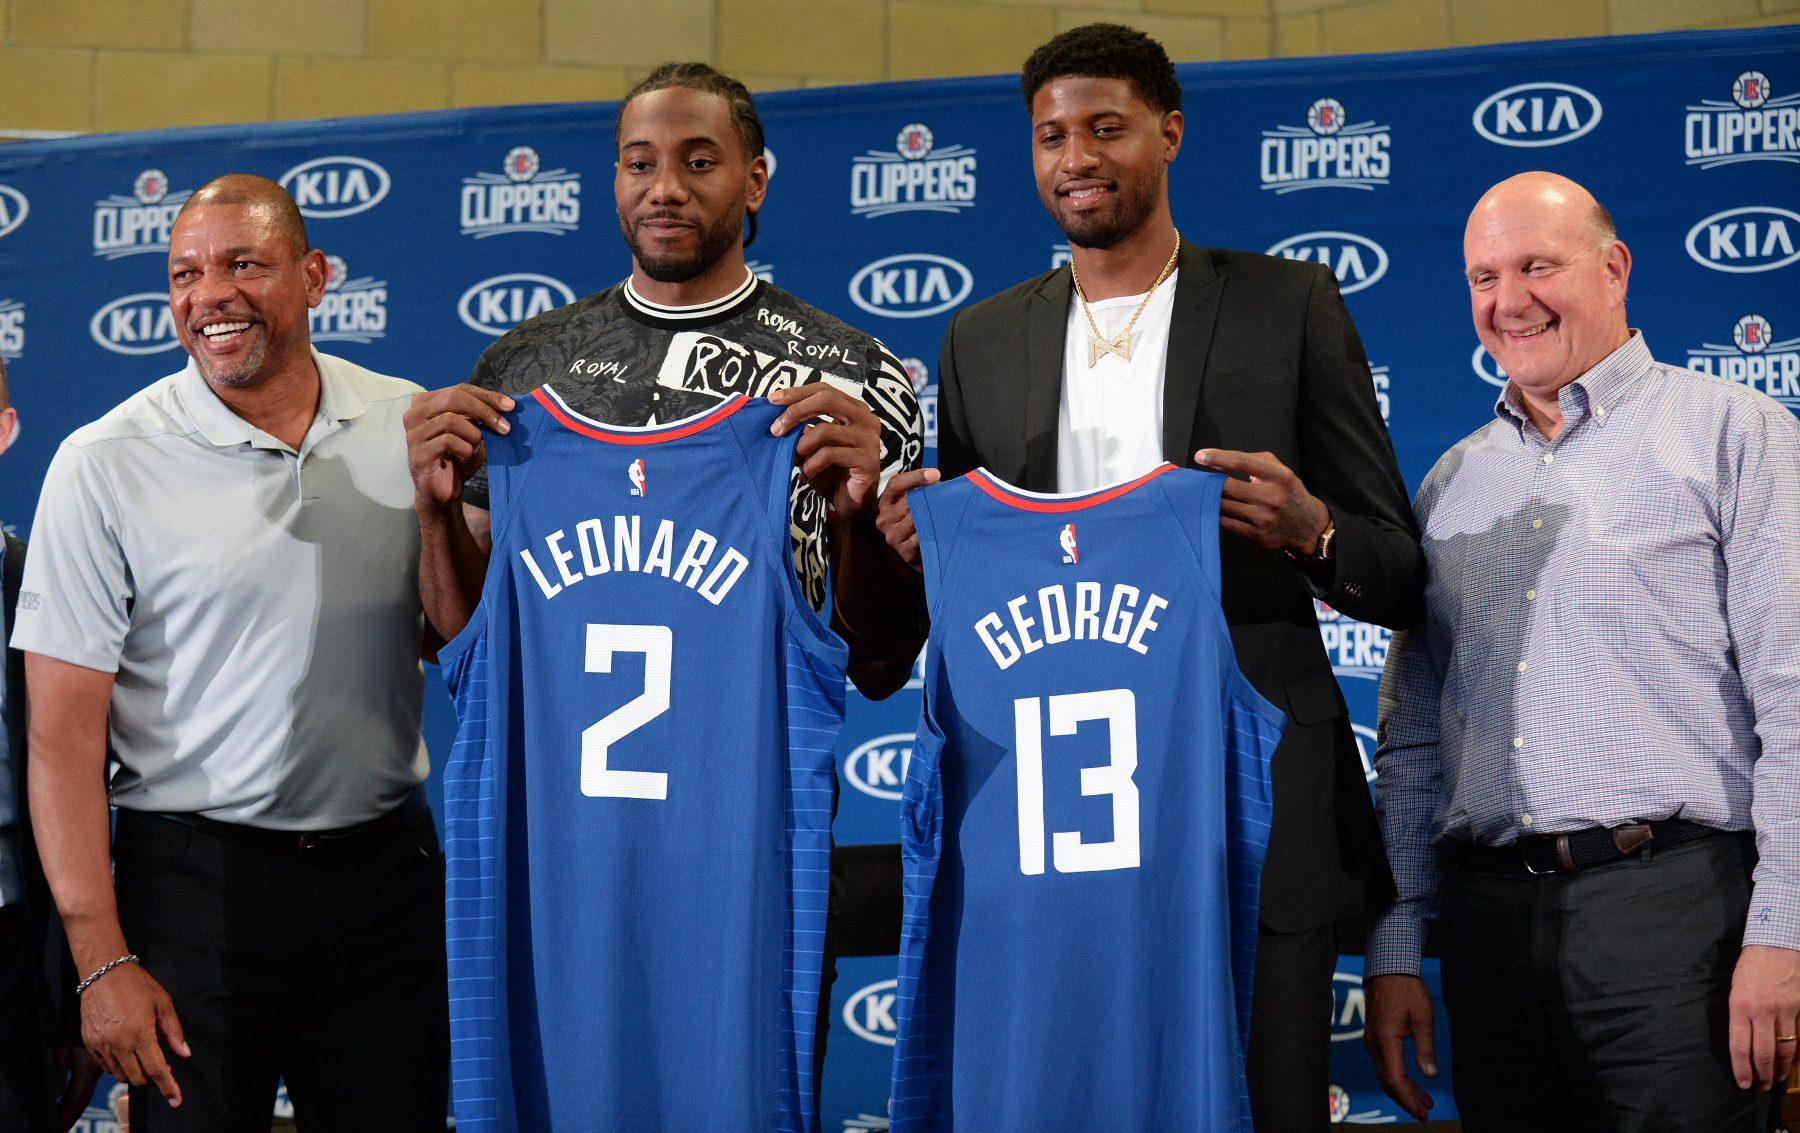 Kawhi Leonard and Paul George Clippers